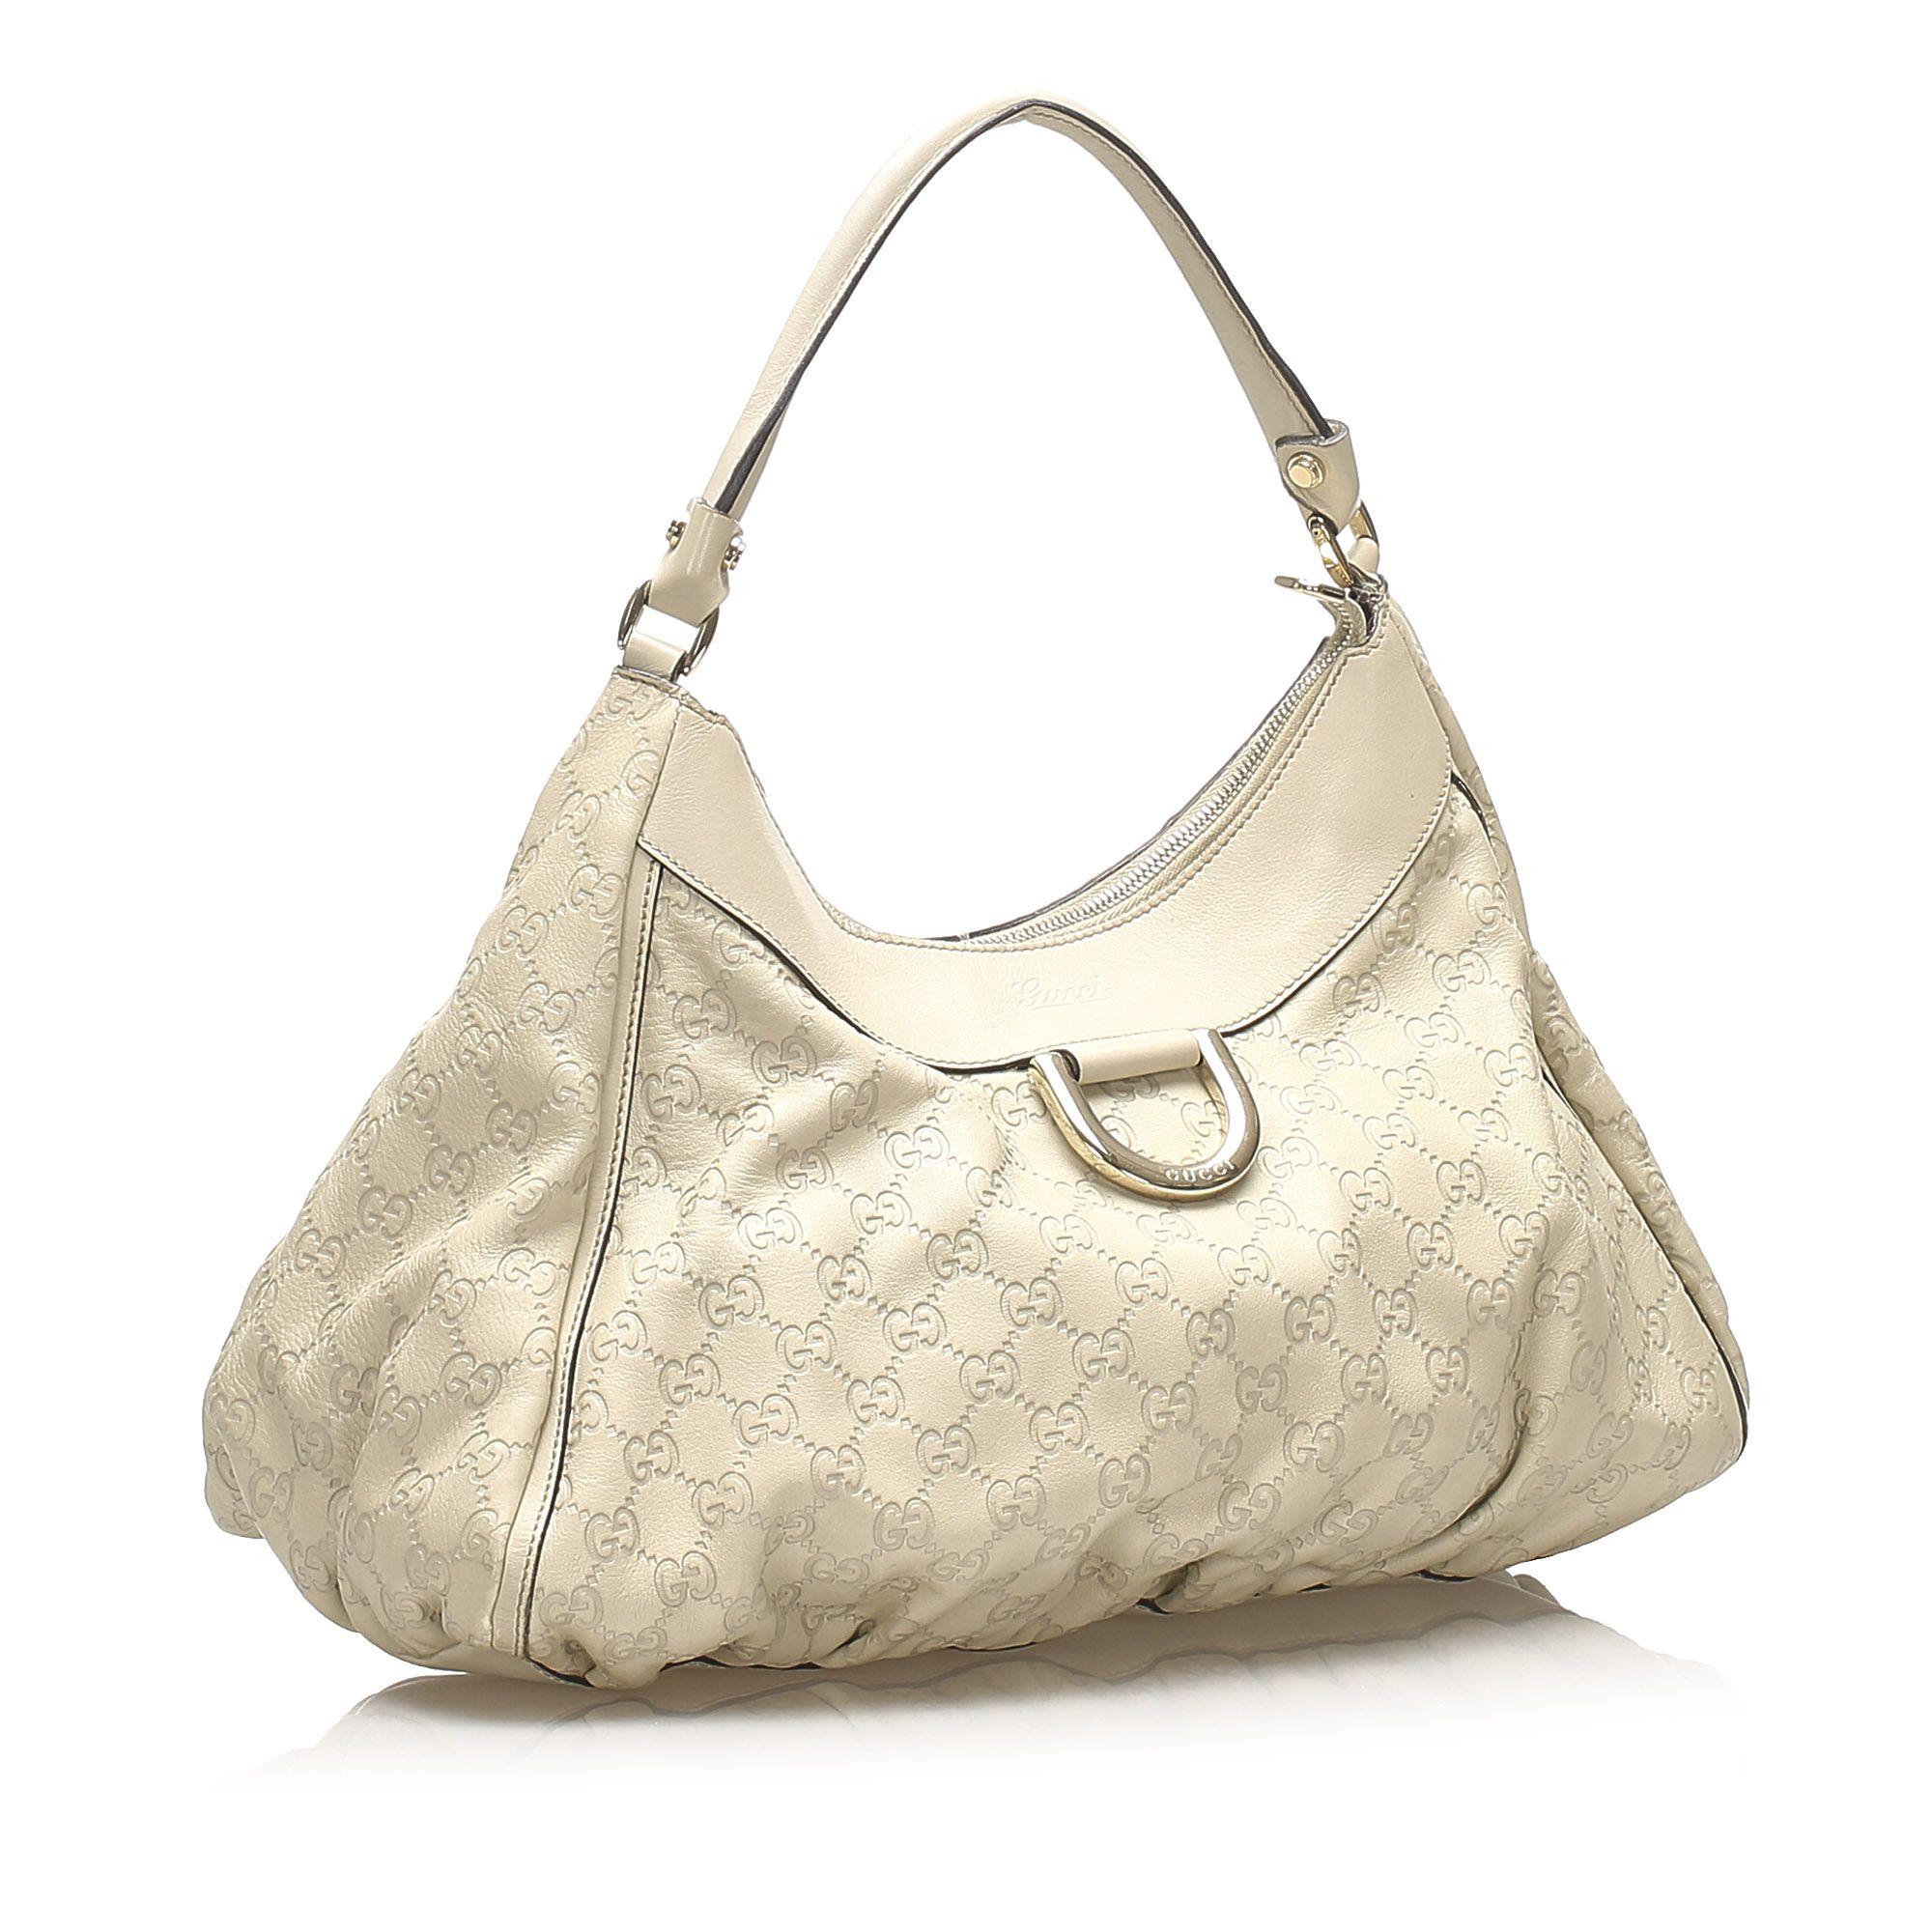 Vintage Gucci Guccissima Abbey D-Ring Shoulder Bag Brown